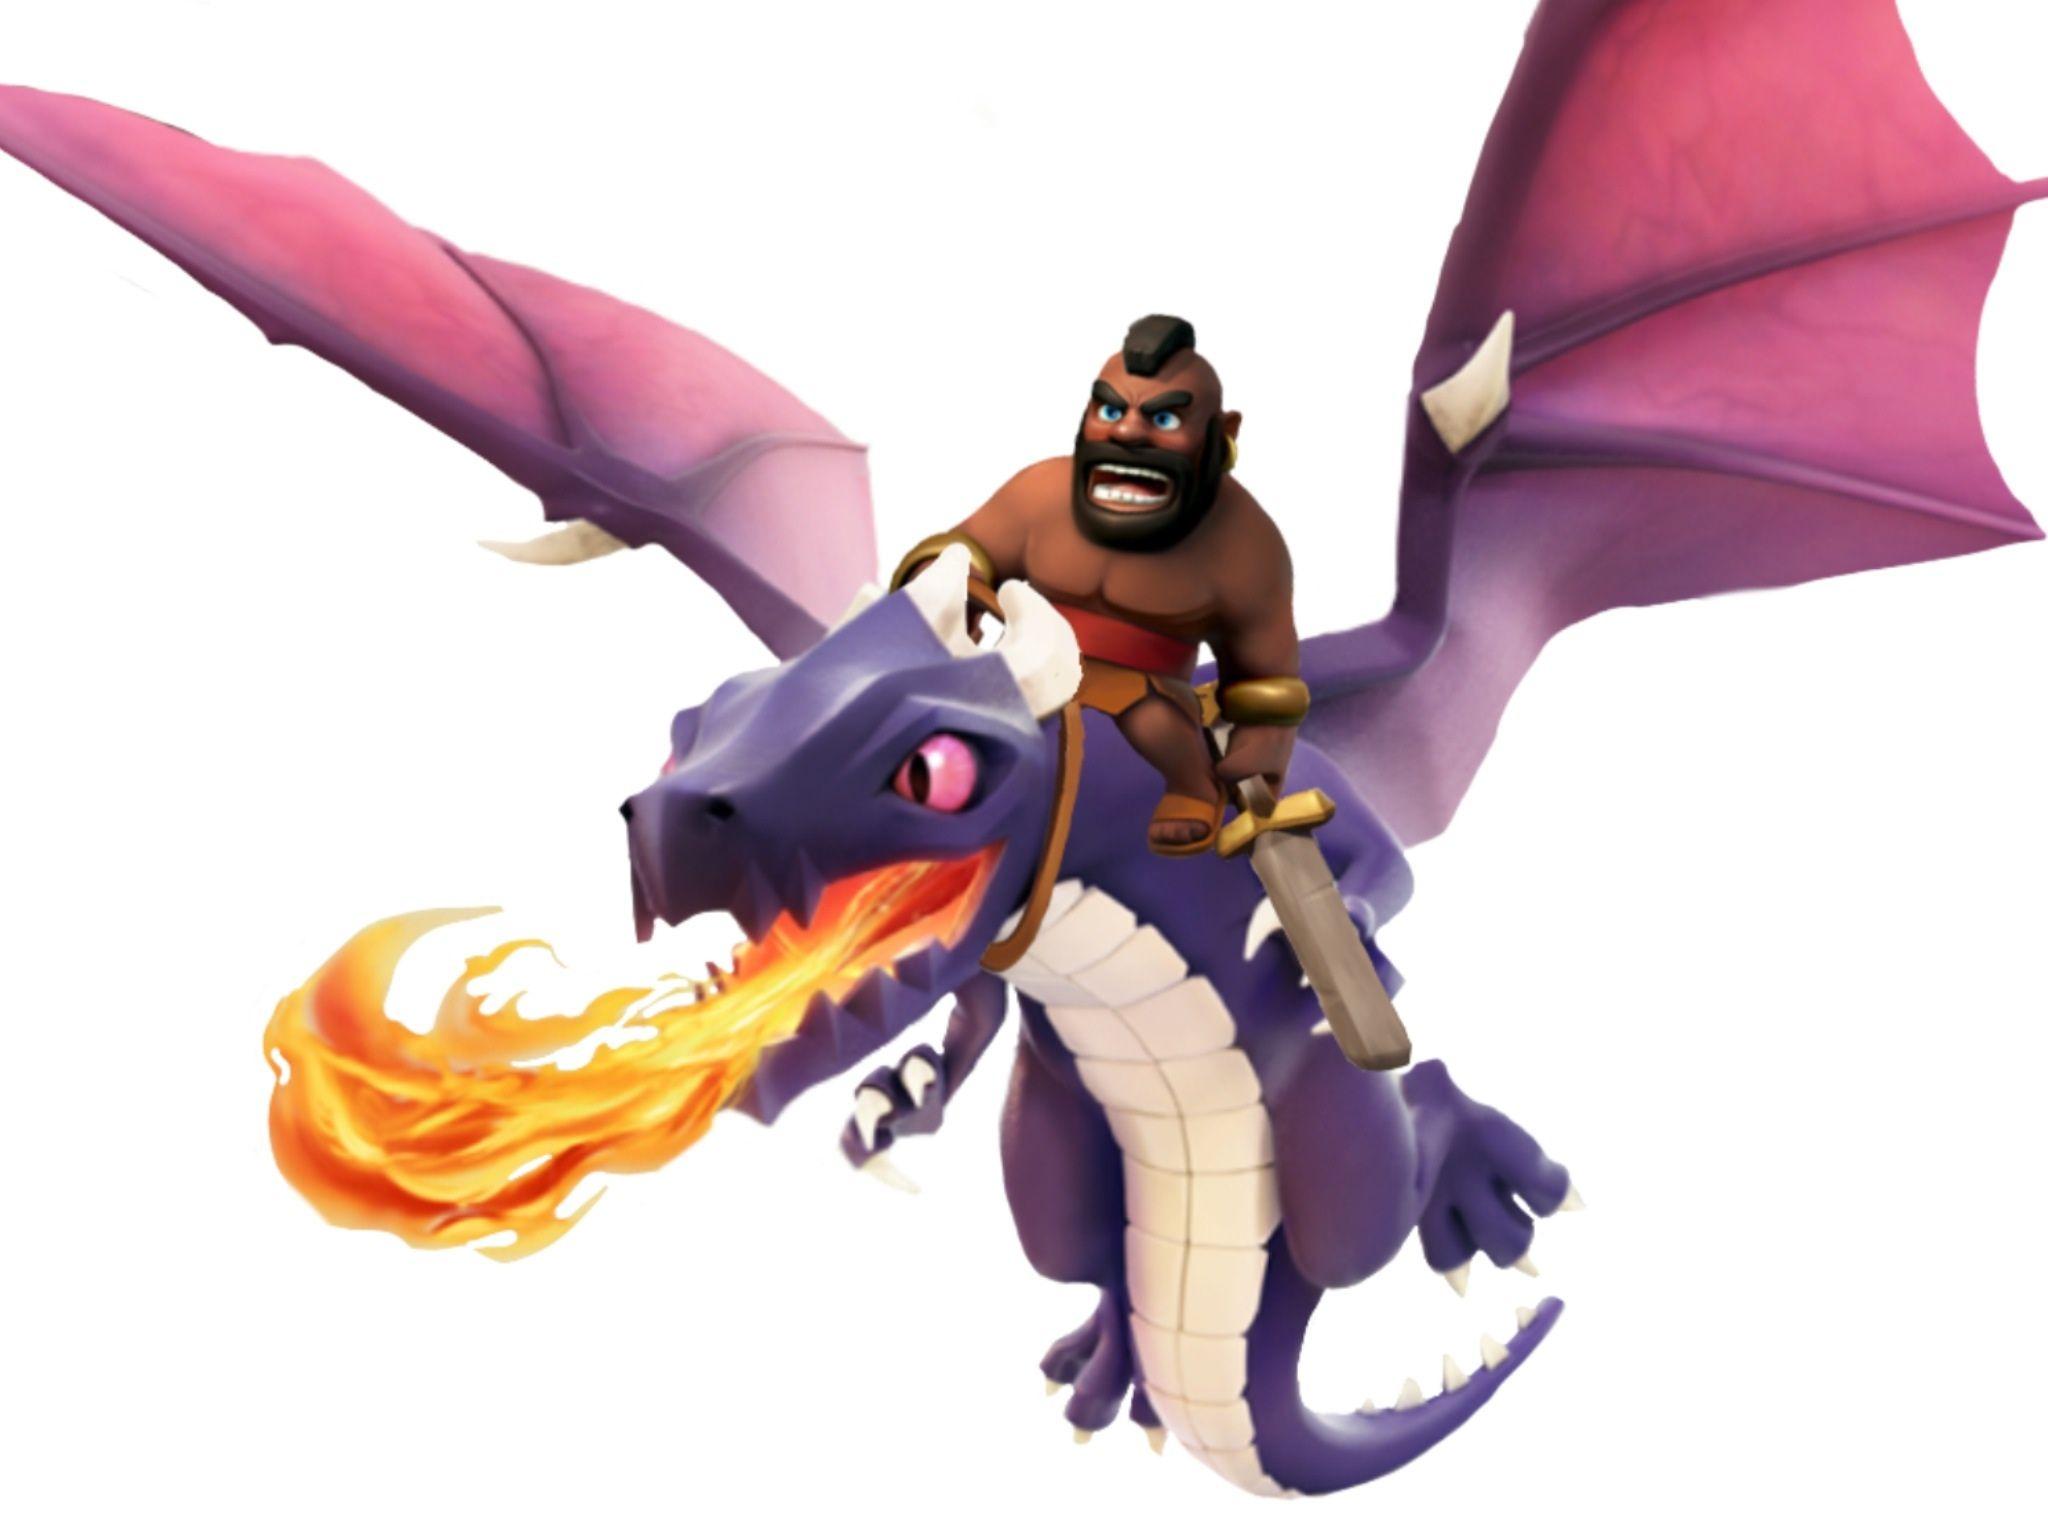 Hog Rider Level Max Google Search Cartoon Wallpaper Hd Clash Of Clans Clash Royale